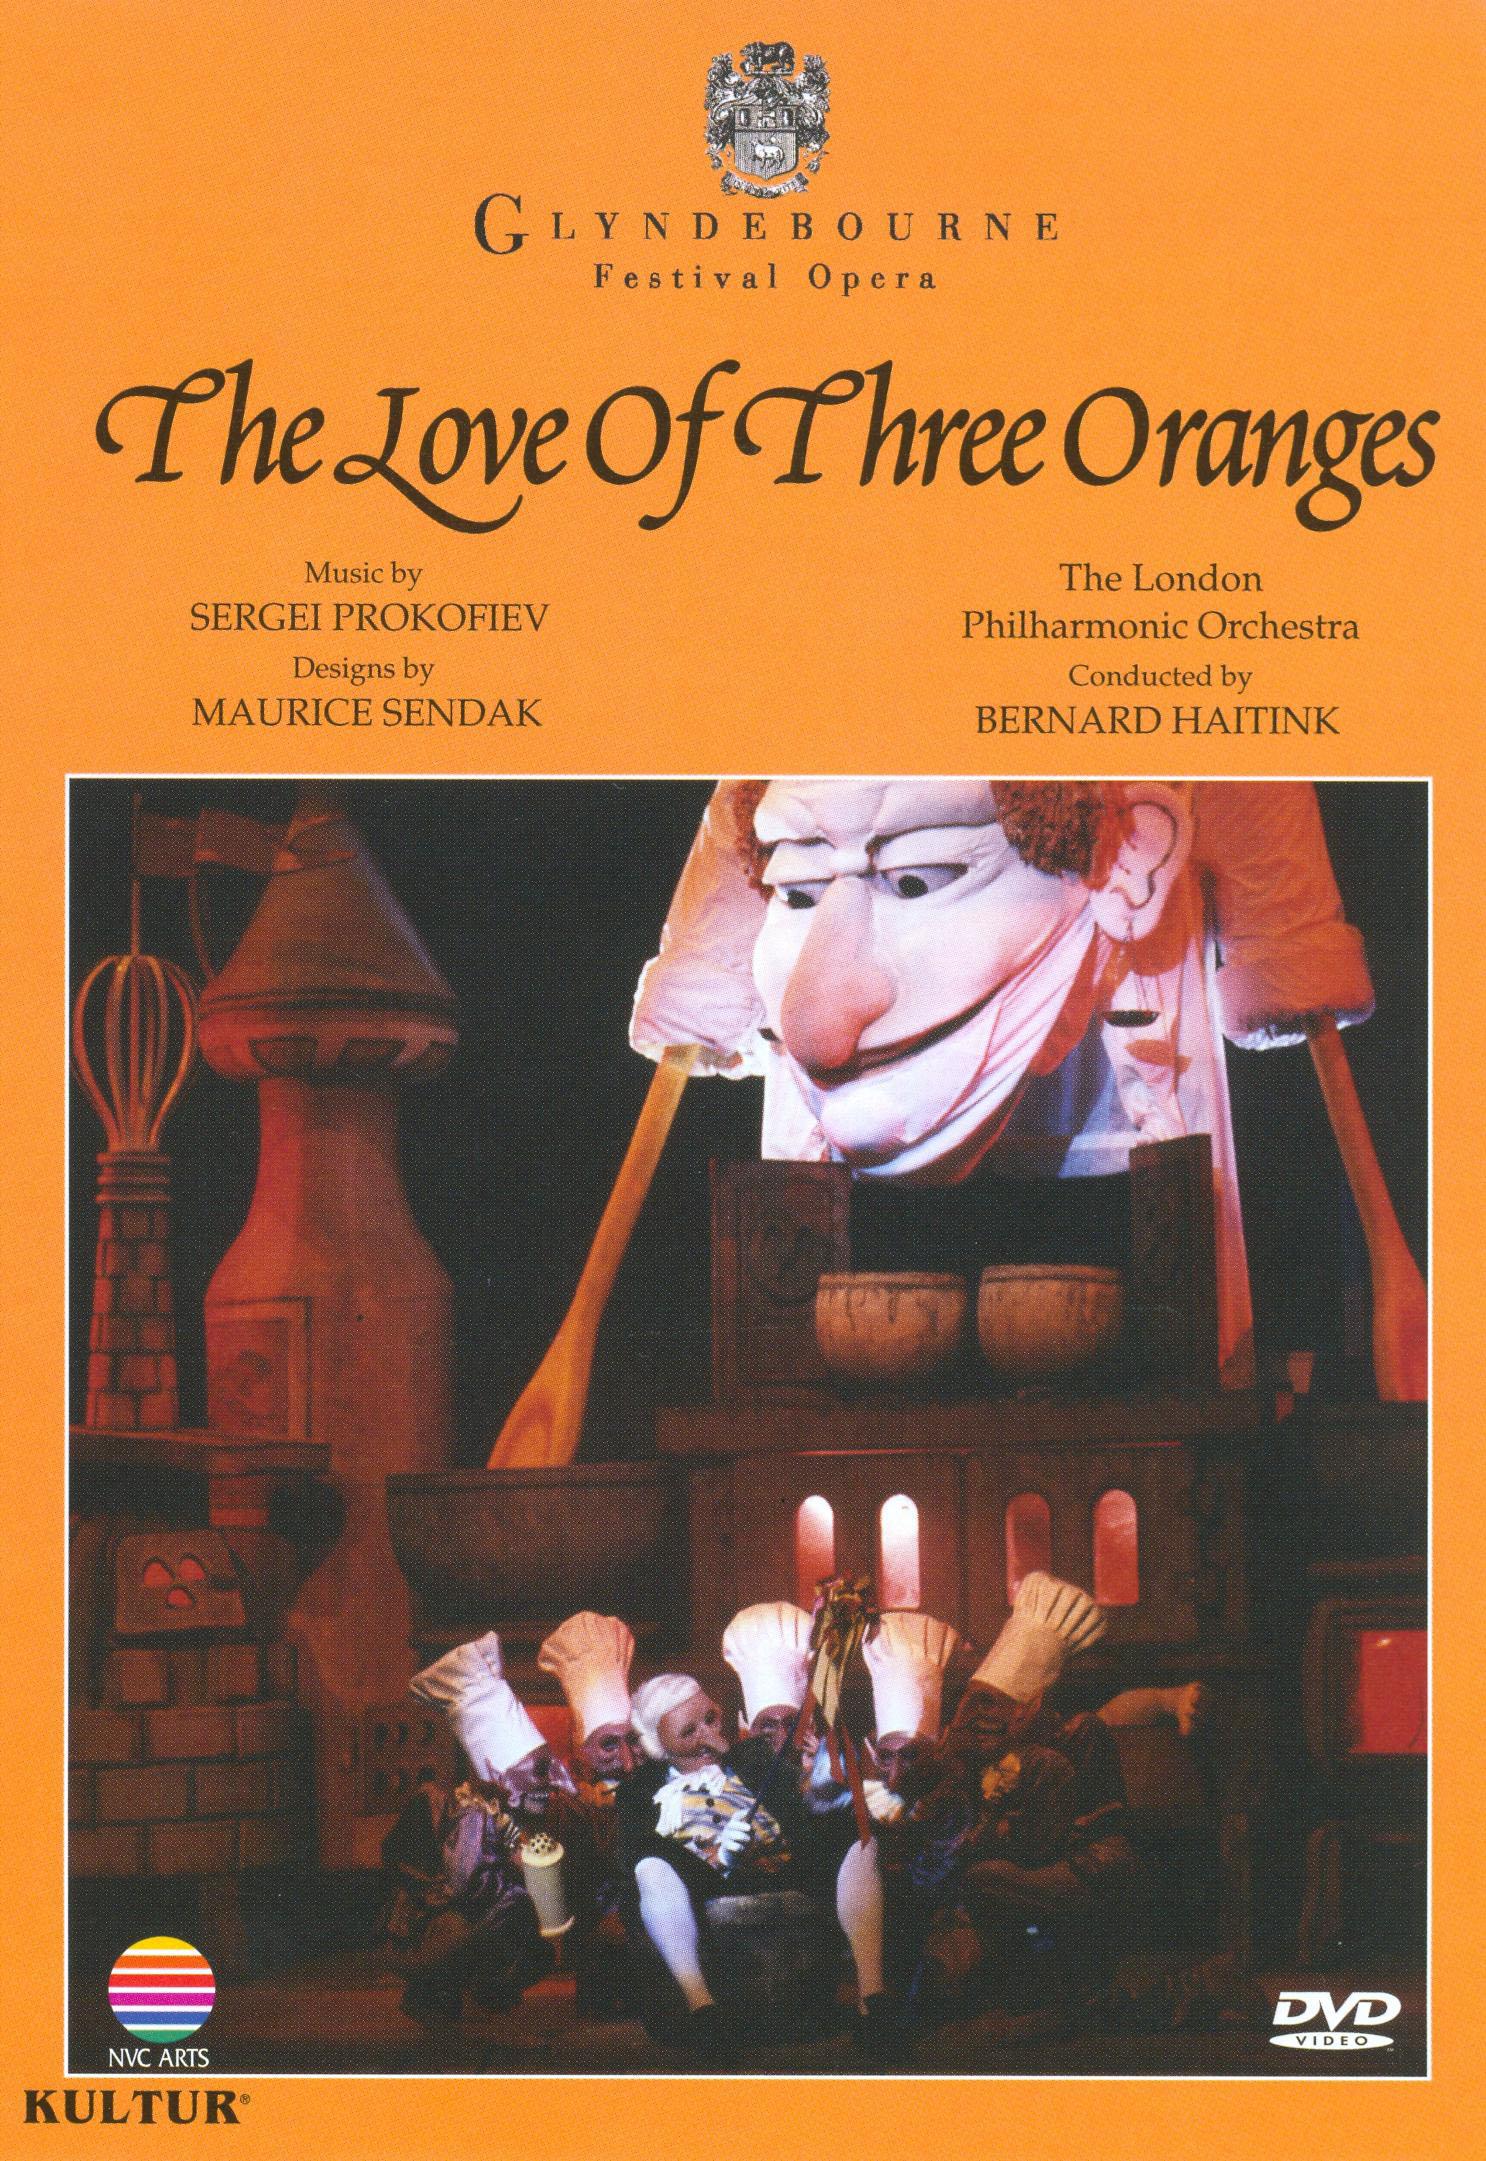 The Love of Three Oranges (Glyndebourne Festival Opera)